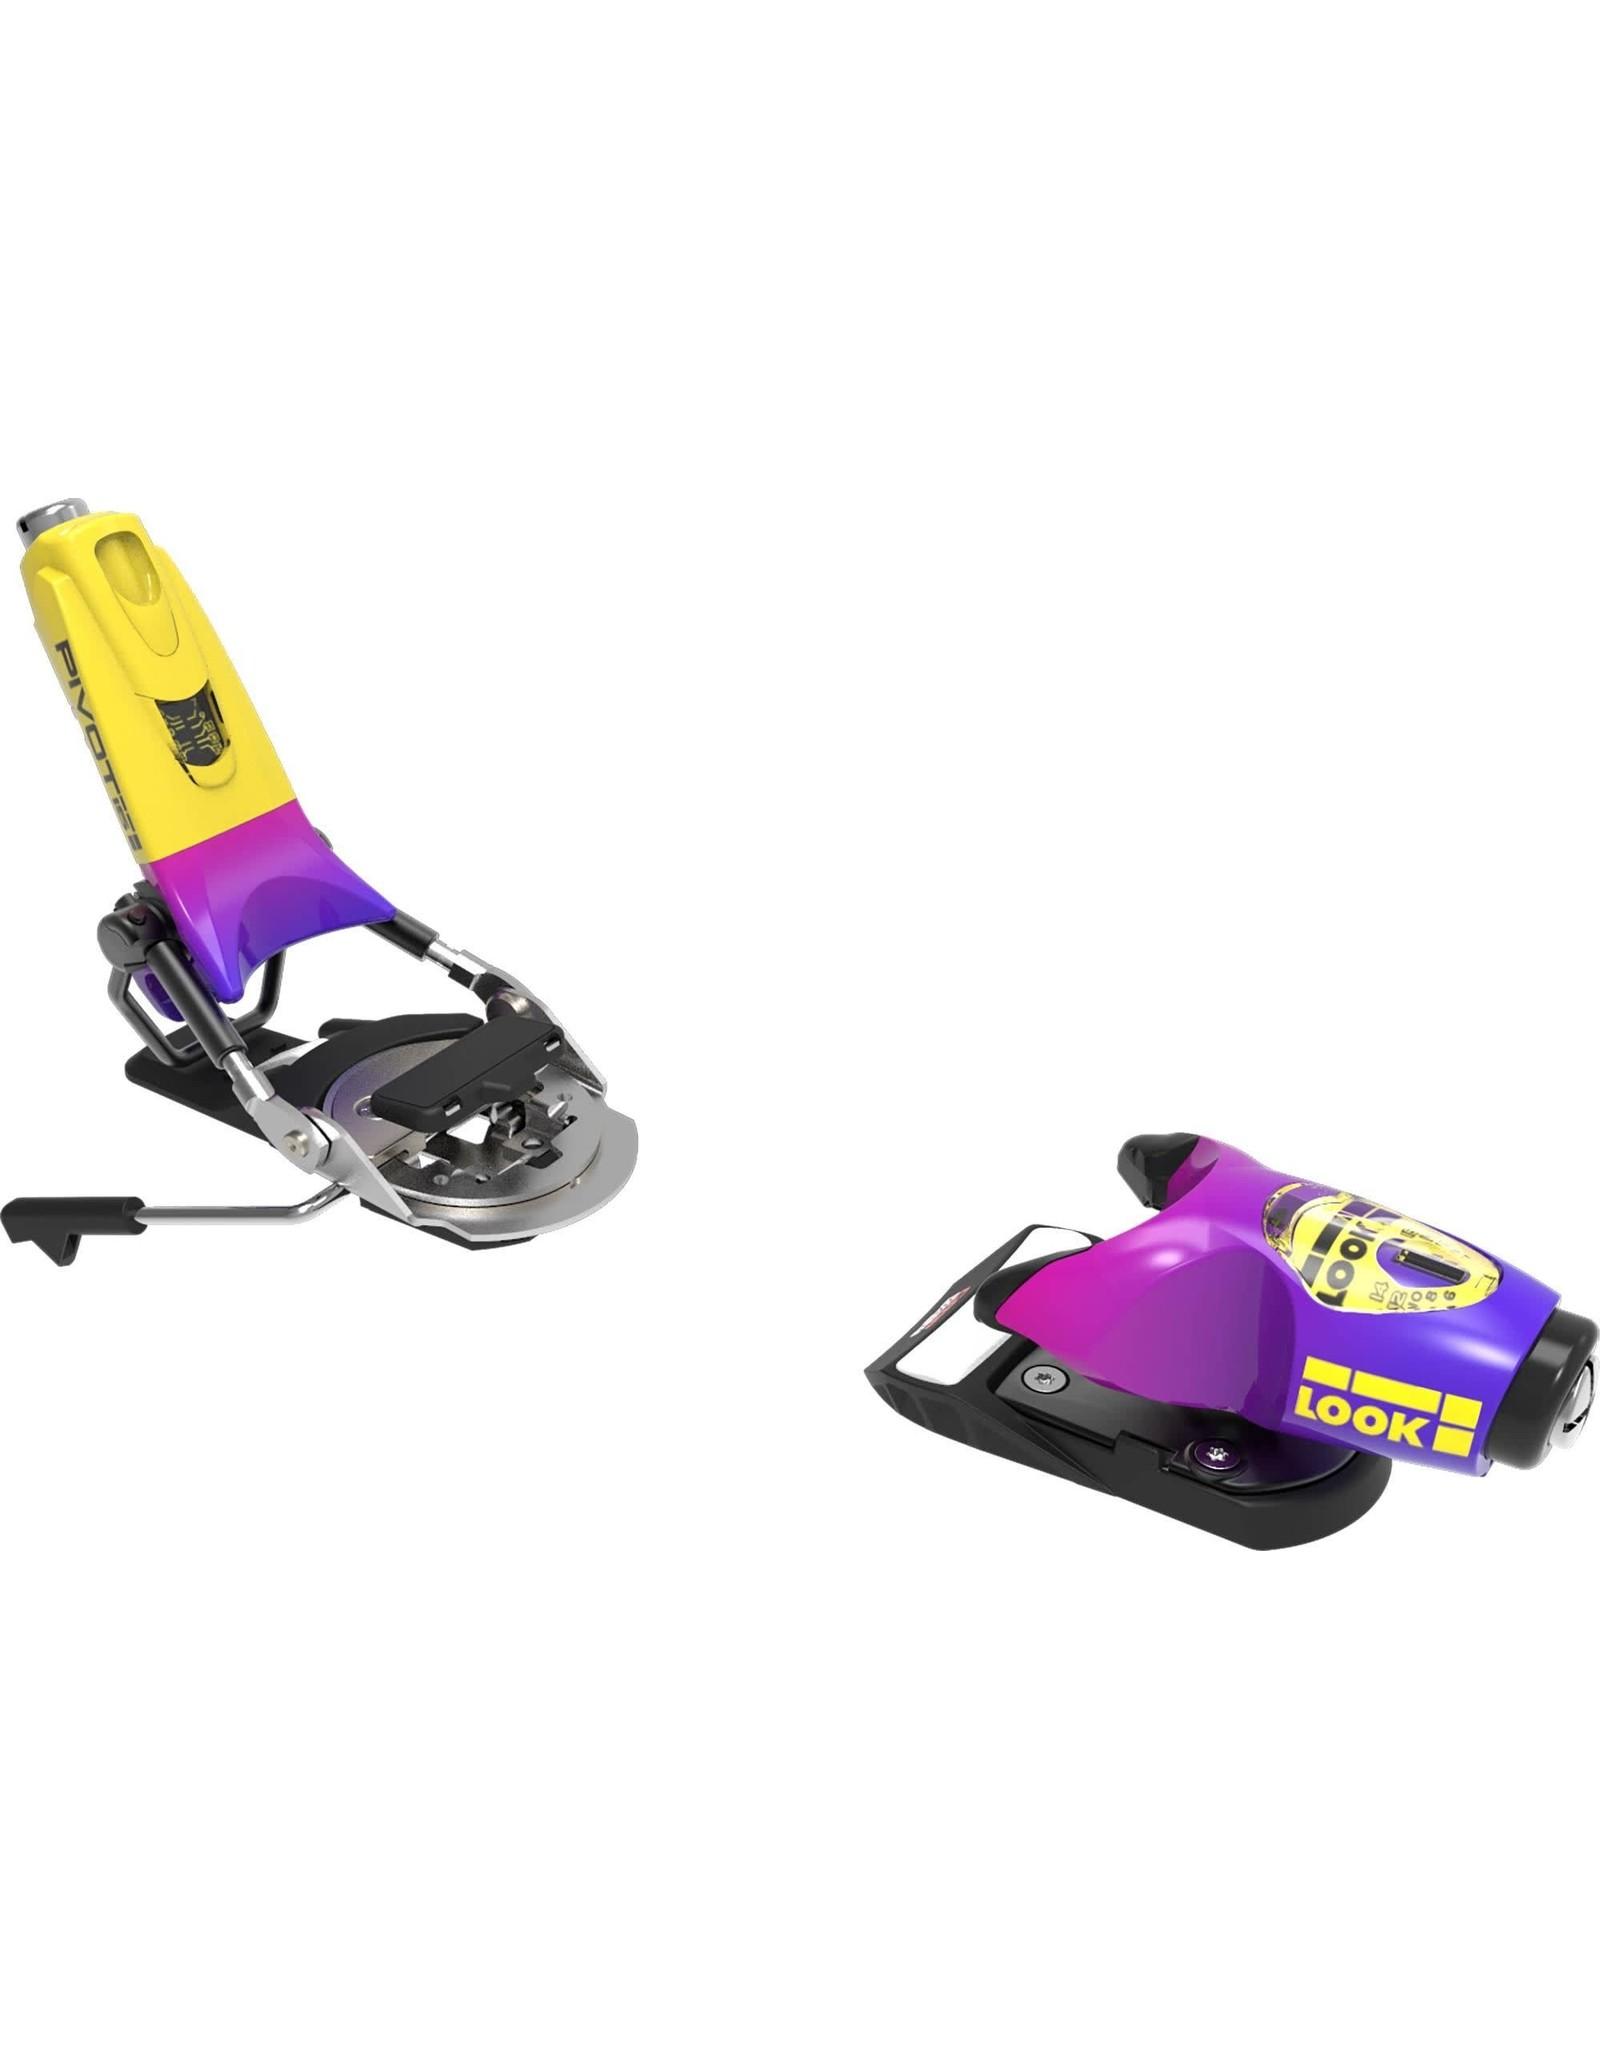 ROSSIGNOL Rossignol Pivot 15 GW B95 Forza 2.0 alpine ski binding 22